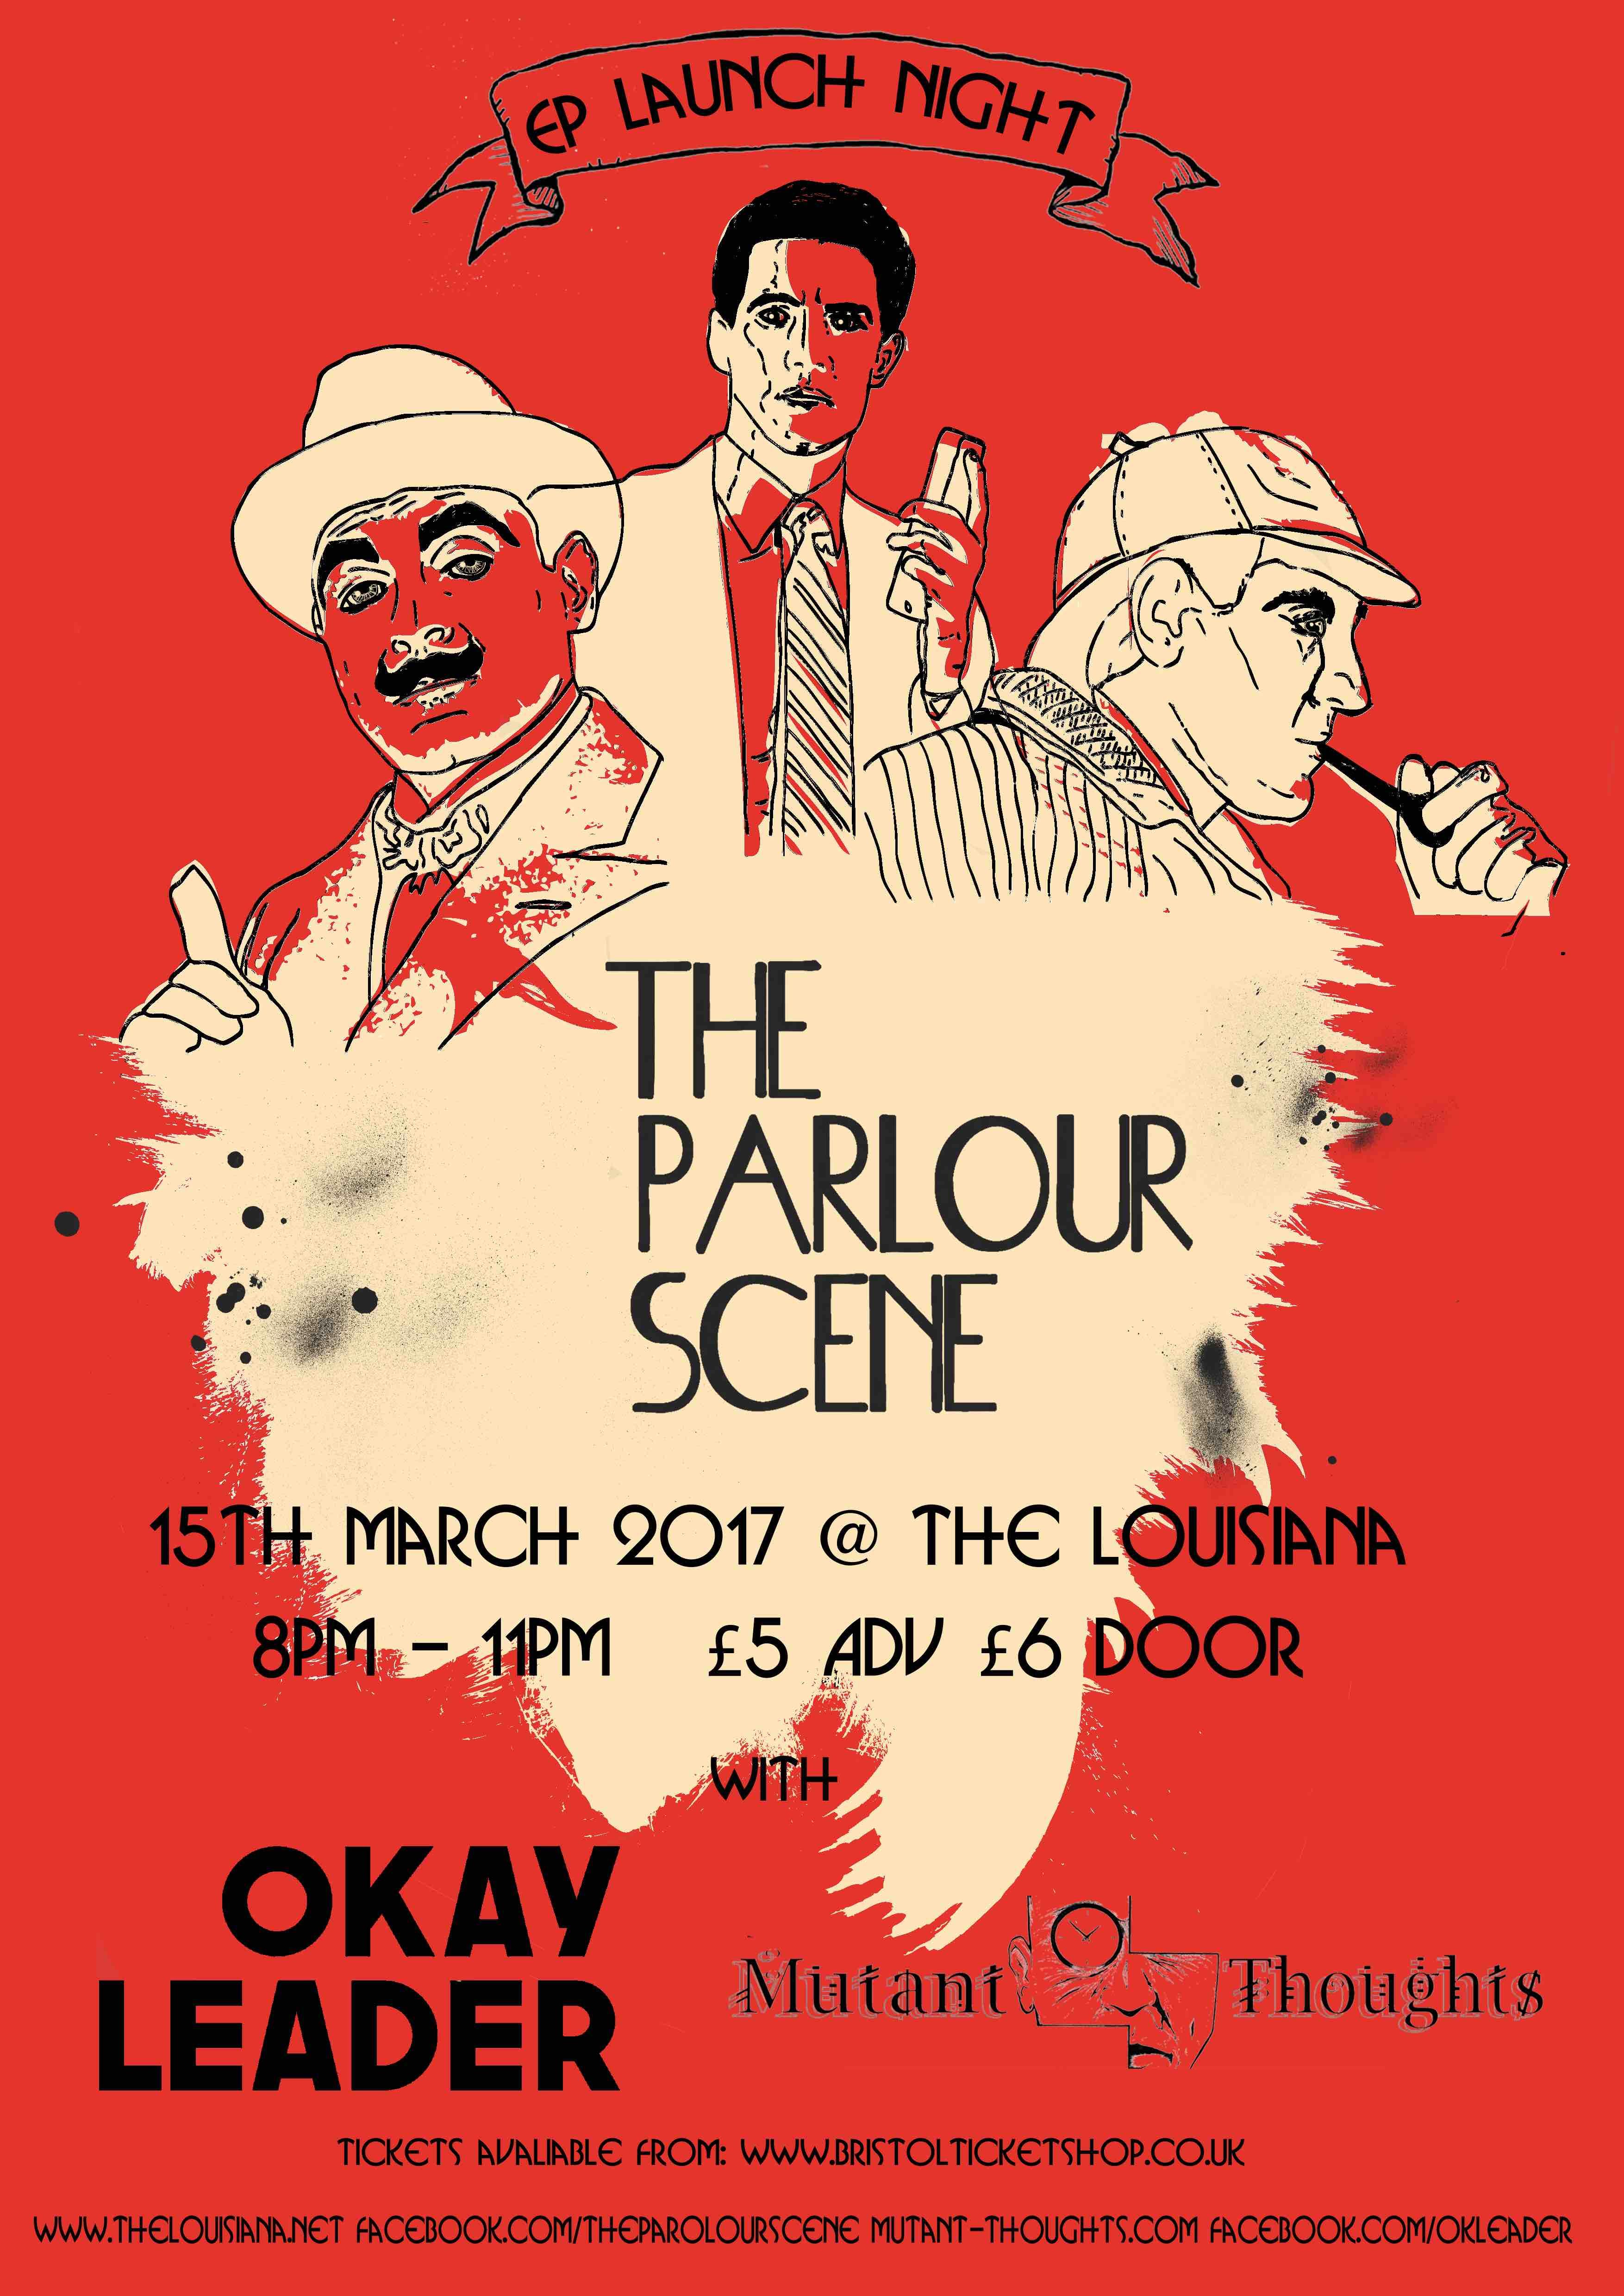 The Parlour Scene